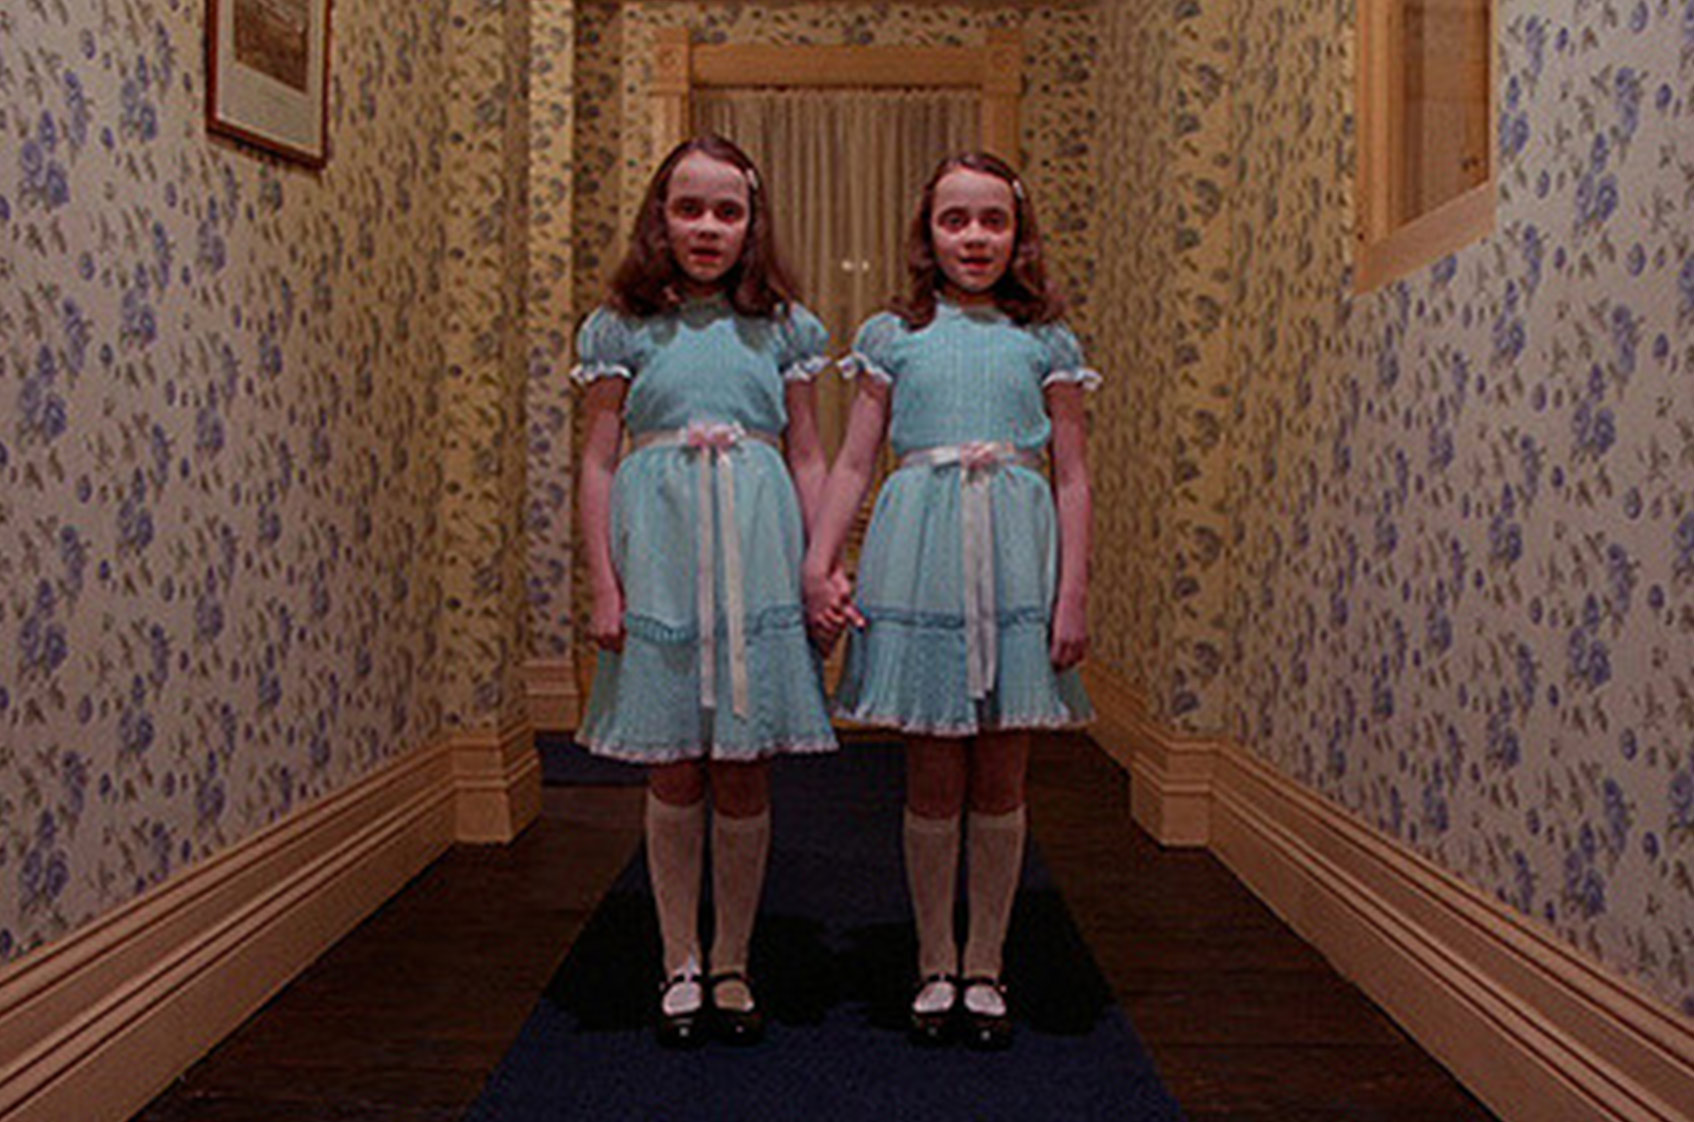 Les jumelles Grady dans Shining de Stanley Kubrick - Copyright © 1980 Warner Bros. Entertainment Inc.